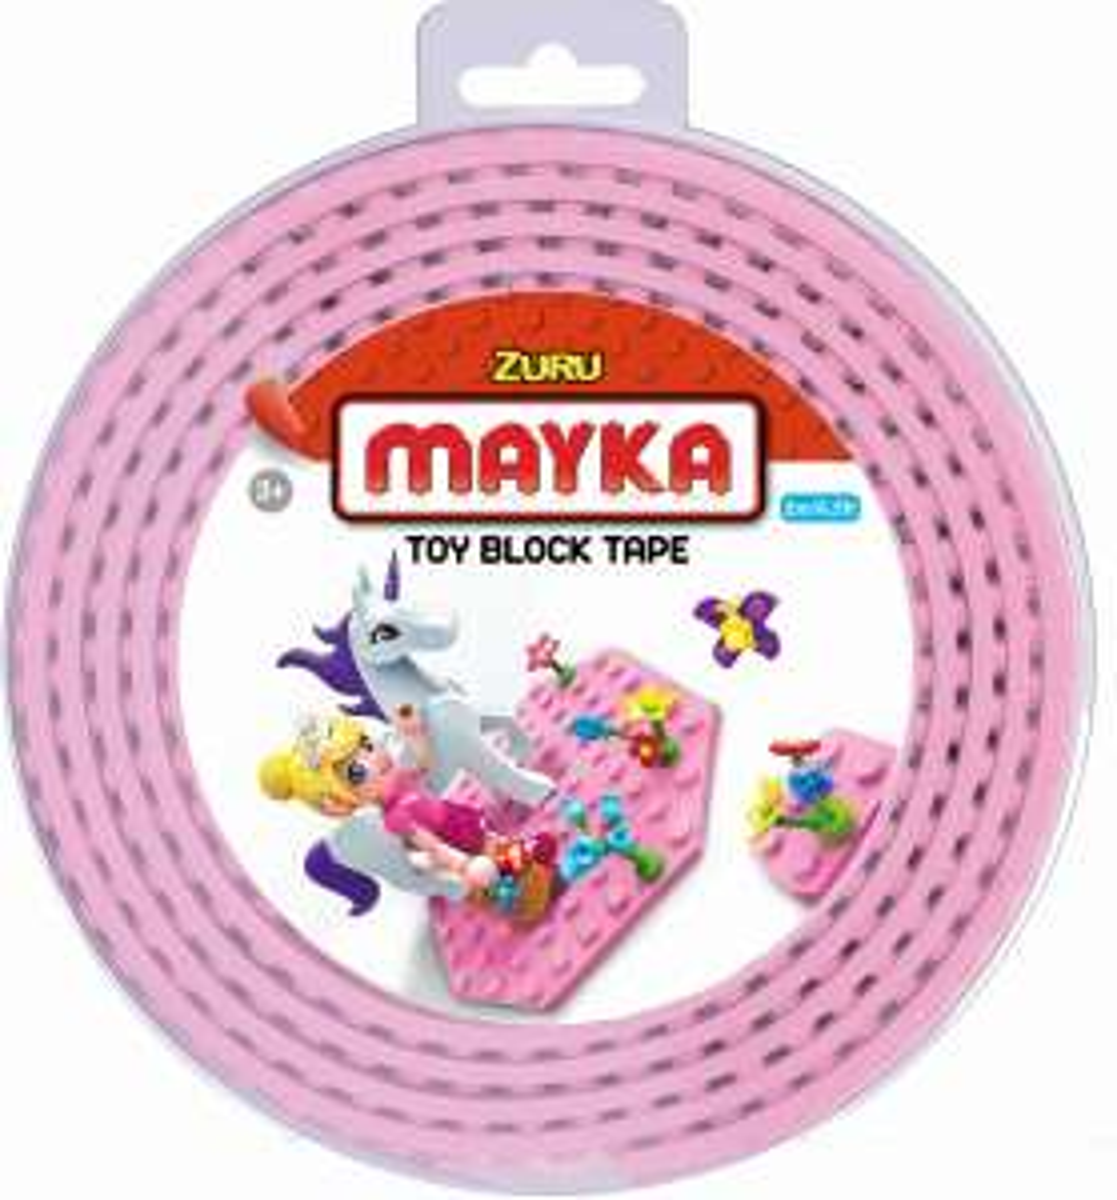 Mayka bouwblokjes tape roze 2 meter / 2 studs voor €2,98 @ Bol.com